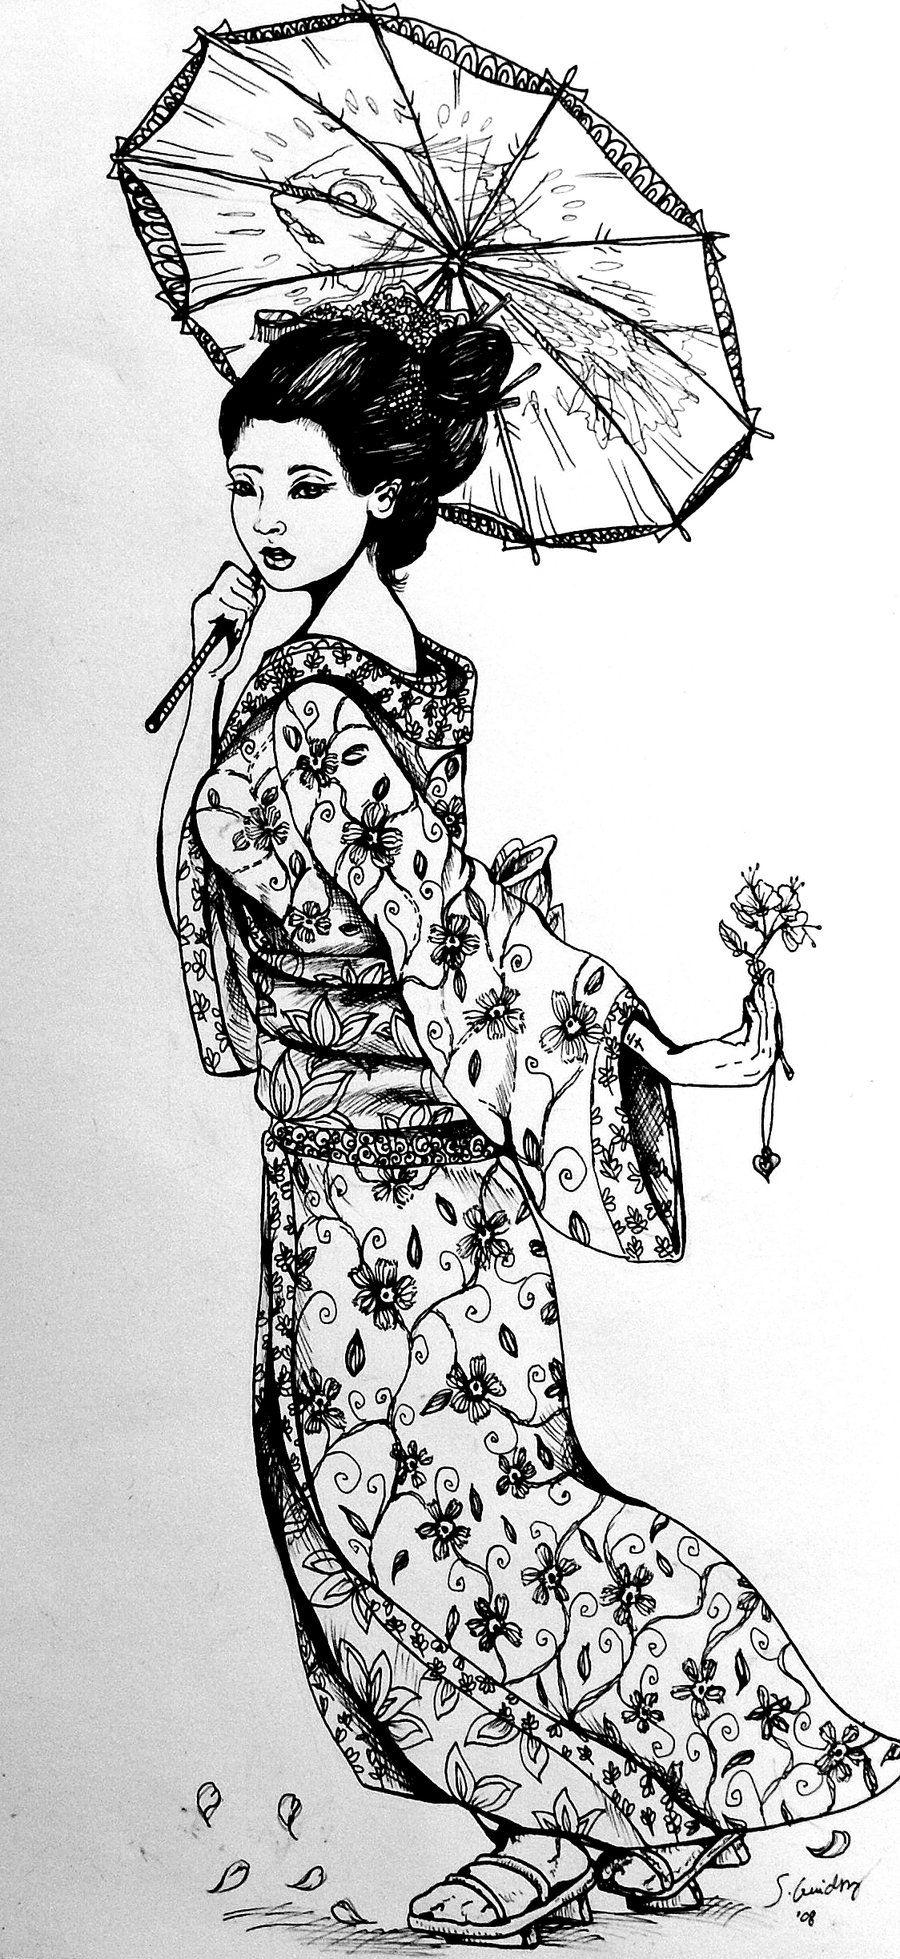 Annabella 67 Art Line Design : Asian art geishas geisha ink by segdavinci on deviantart